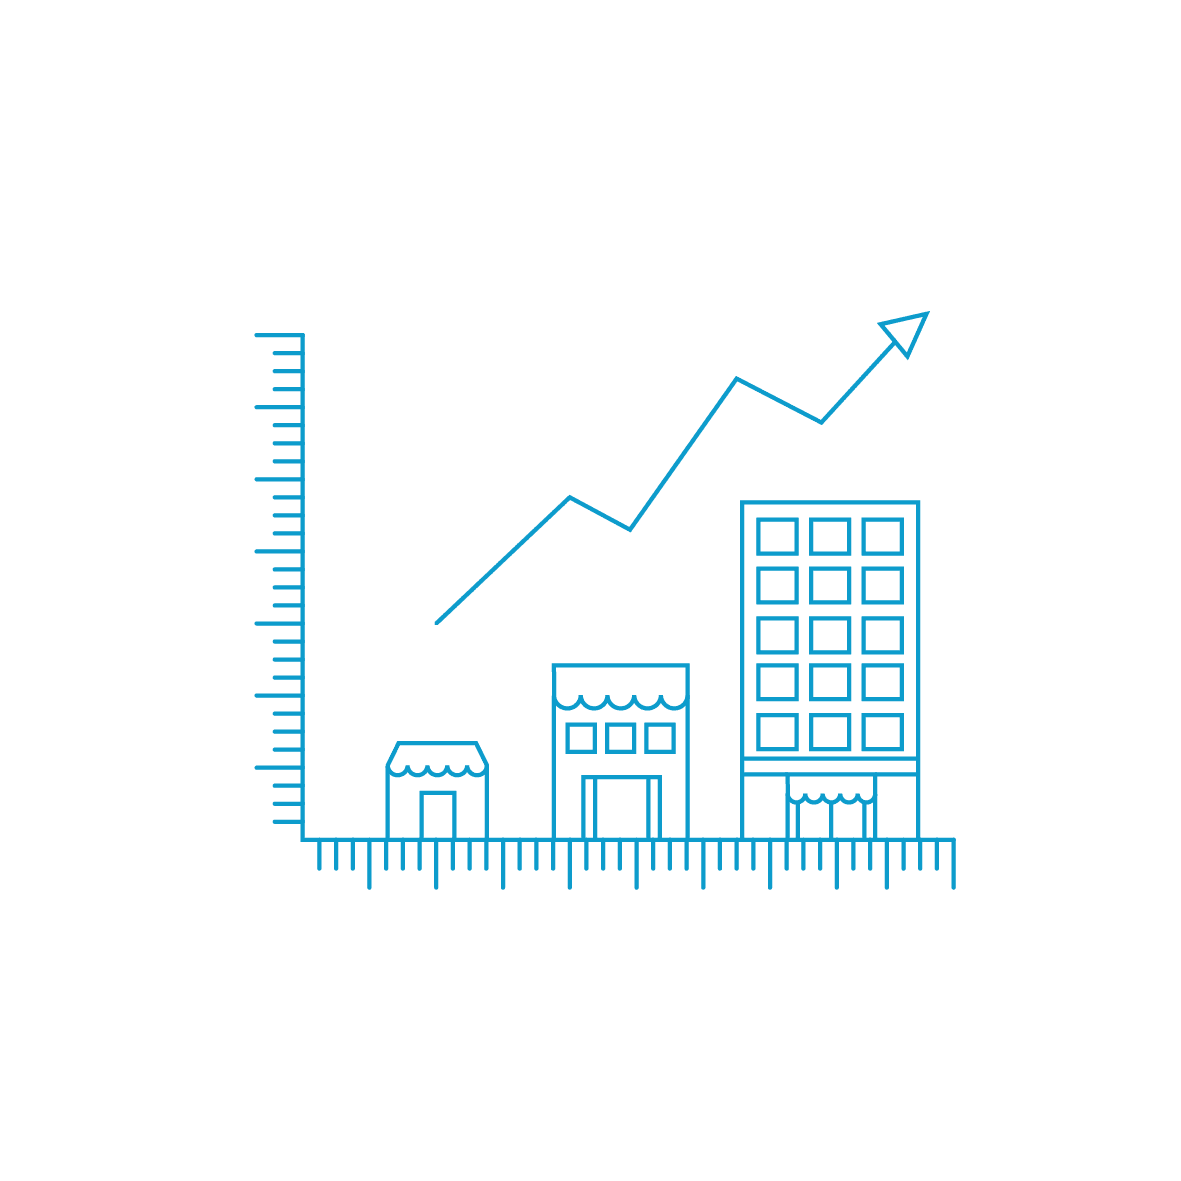 basic_illustrations-62-business_advisory.png